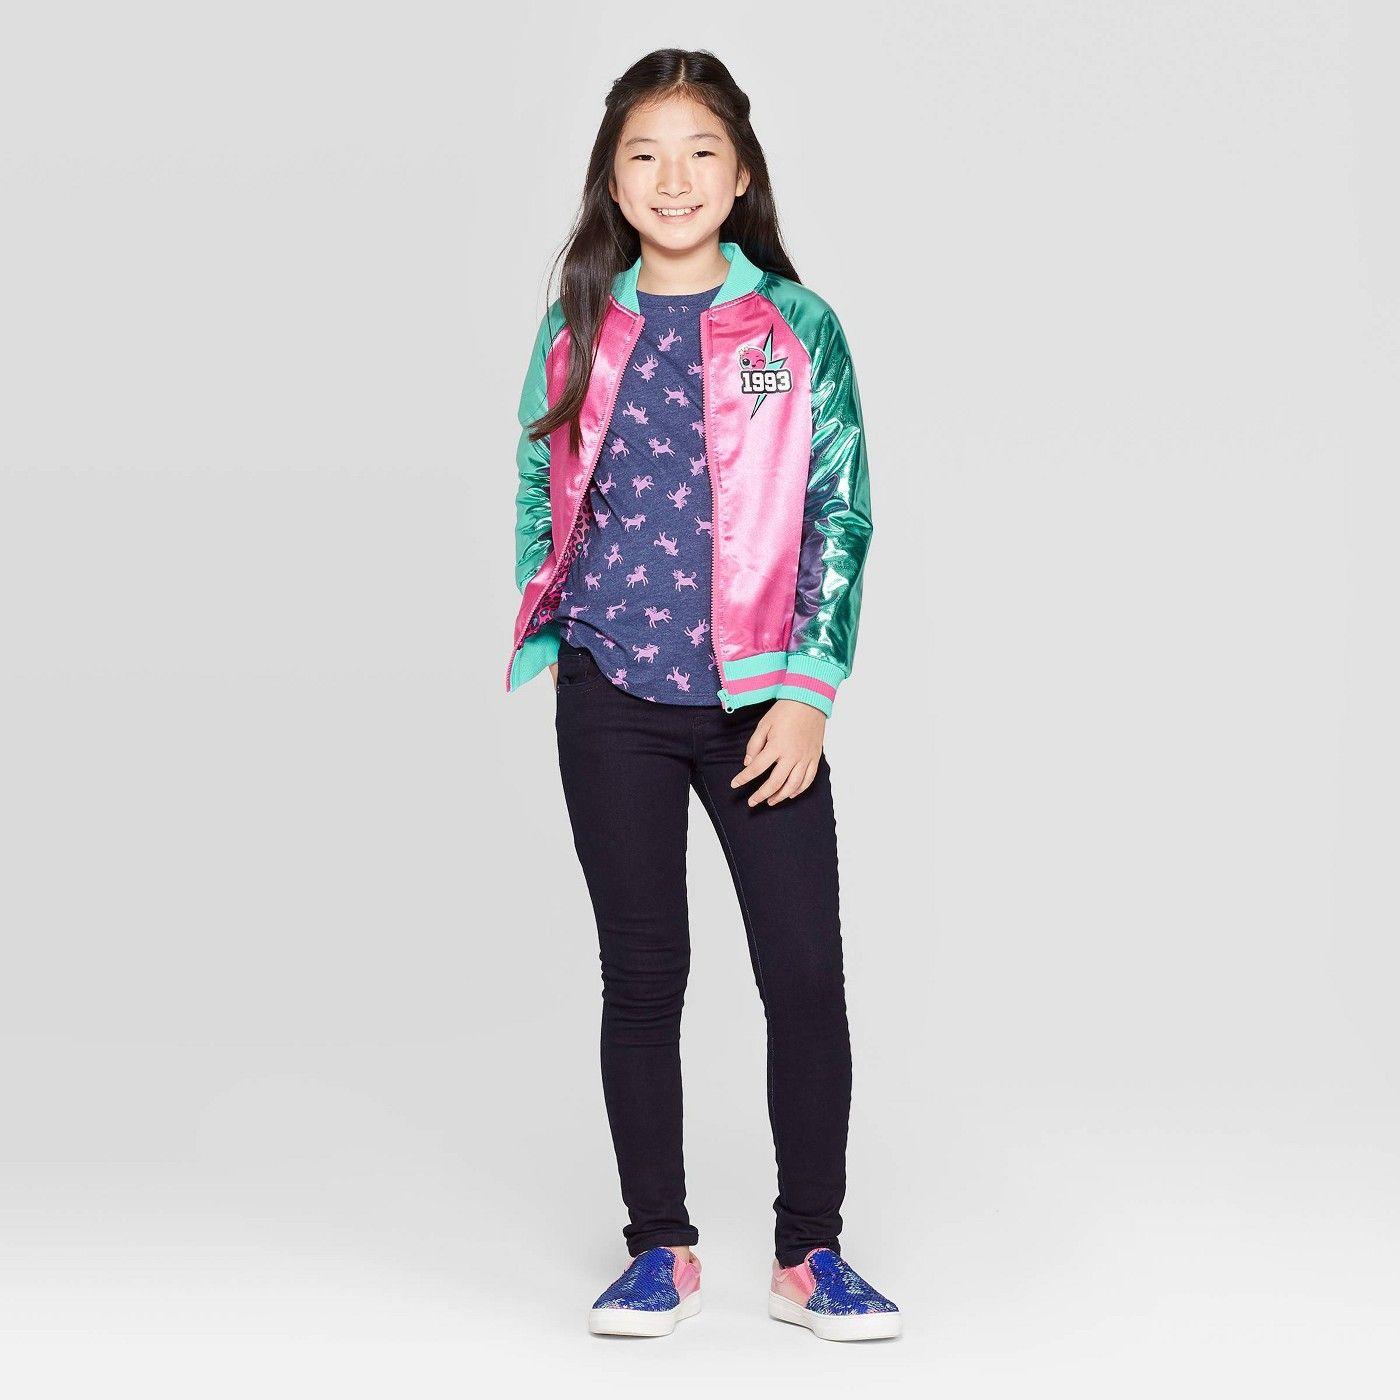 Girls L O L Surprise Go Team Glitter Track Jacket Pink Affiliate Team Ad Surprise Girls Jackets Pink Bomber Jacket Track Jackets [ 1400 x 1400 Pixel ]